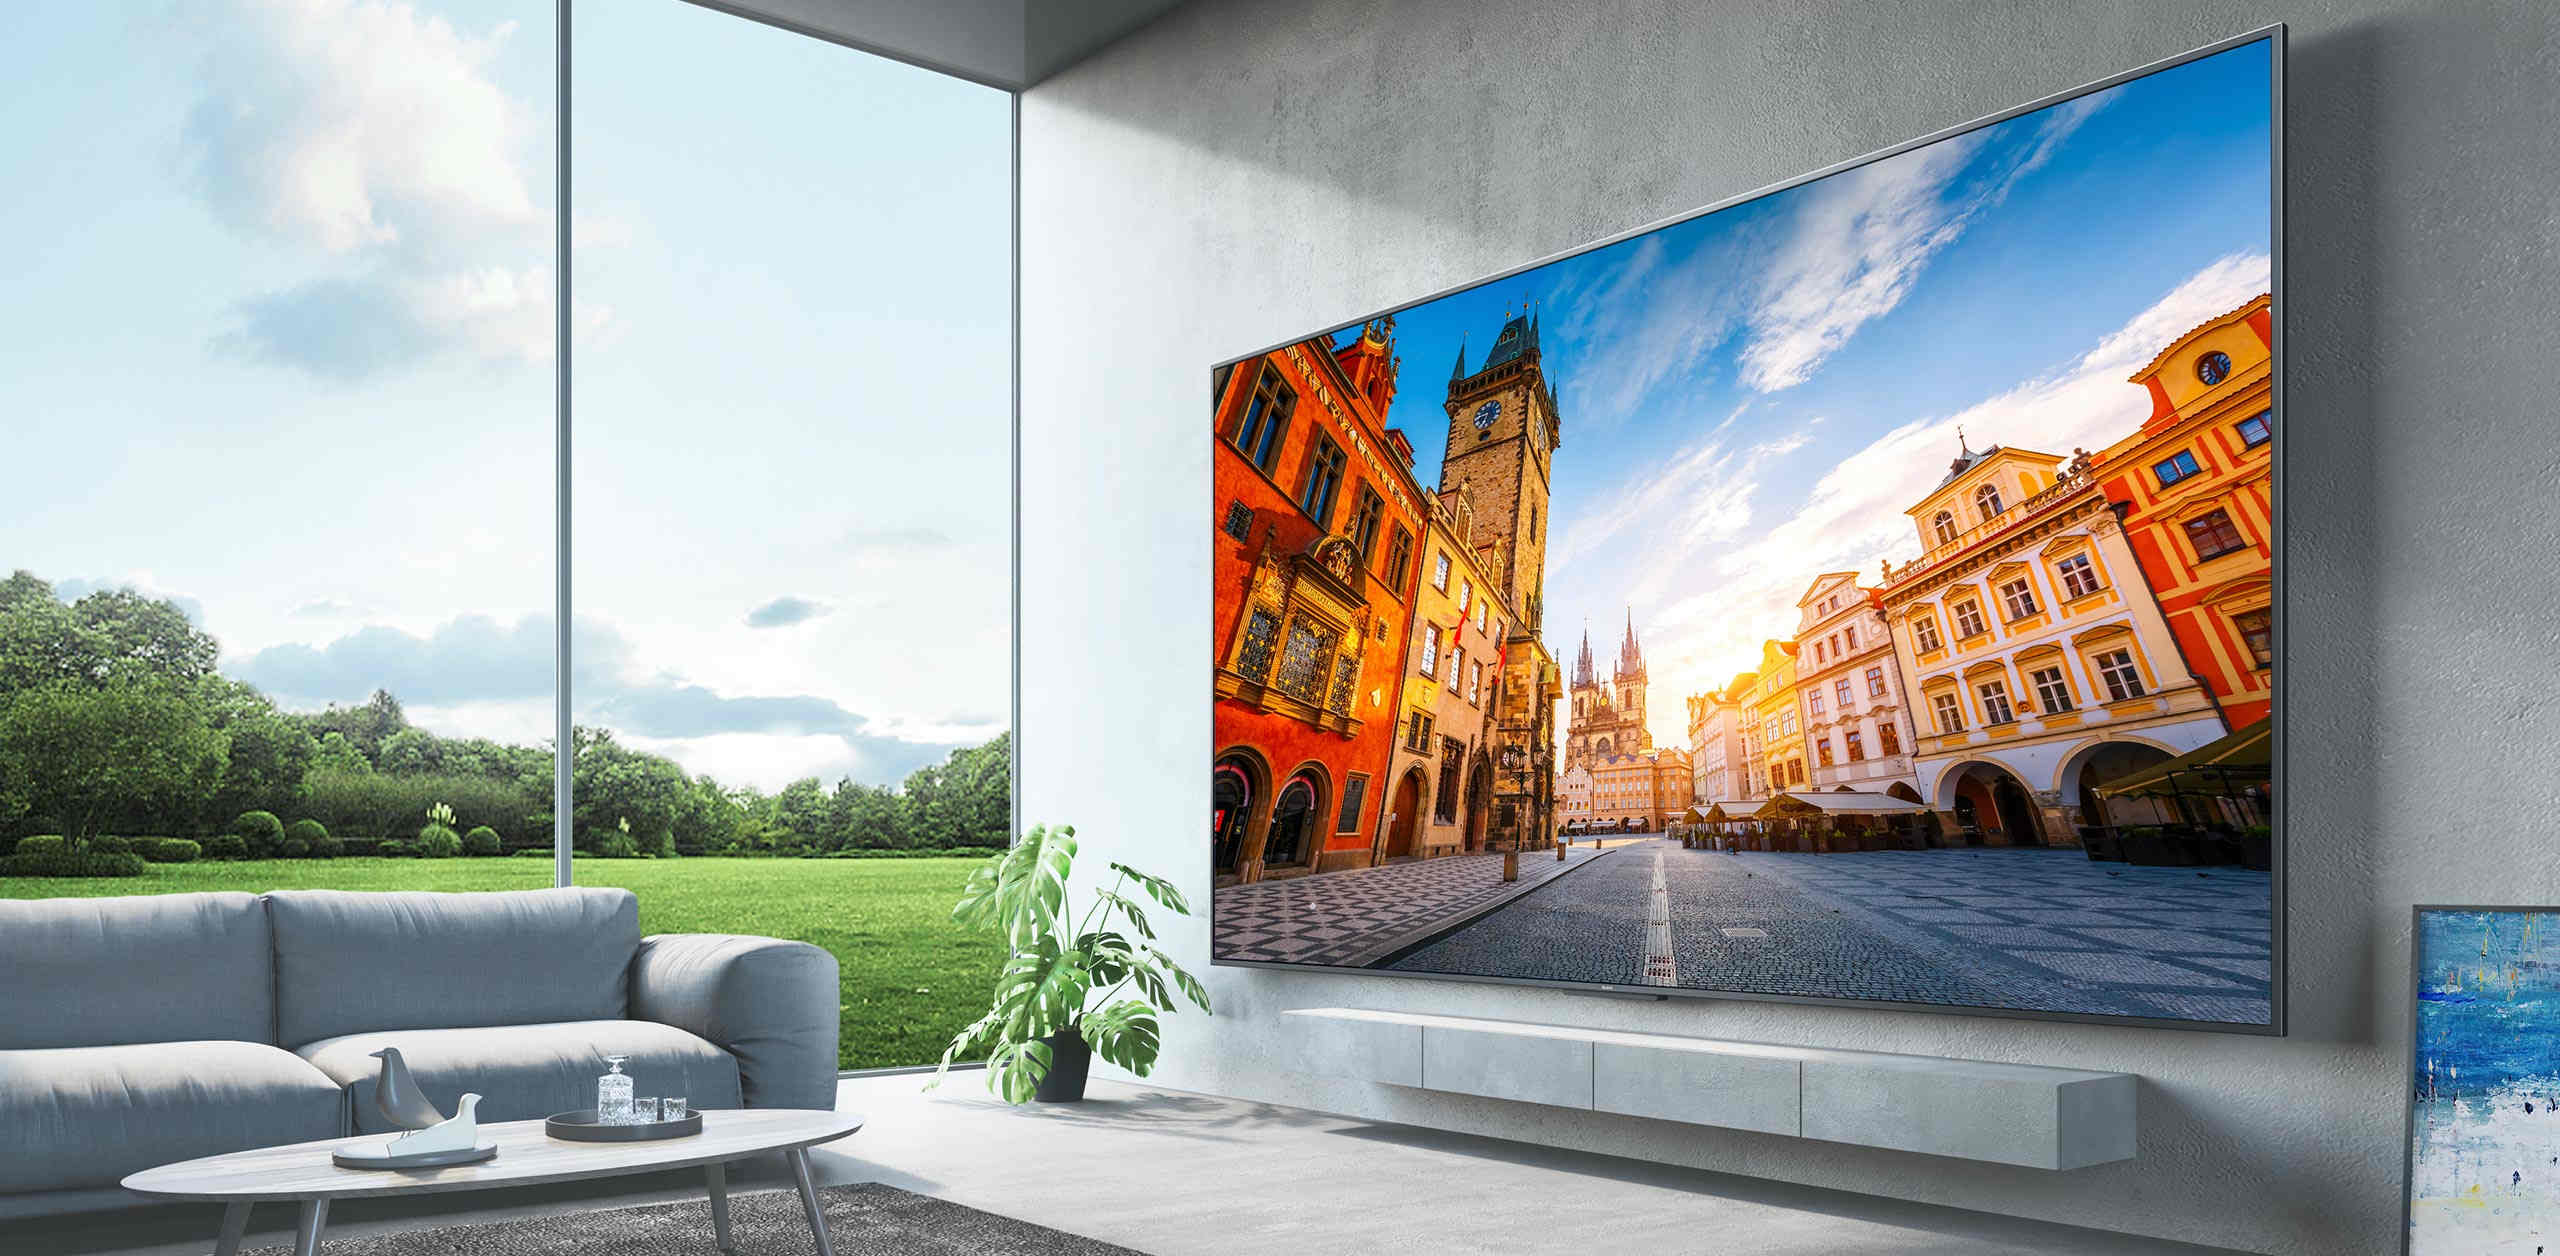 Tivi Xiaomi Redmi Smart TV Max 98 Inch